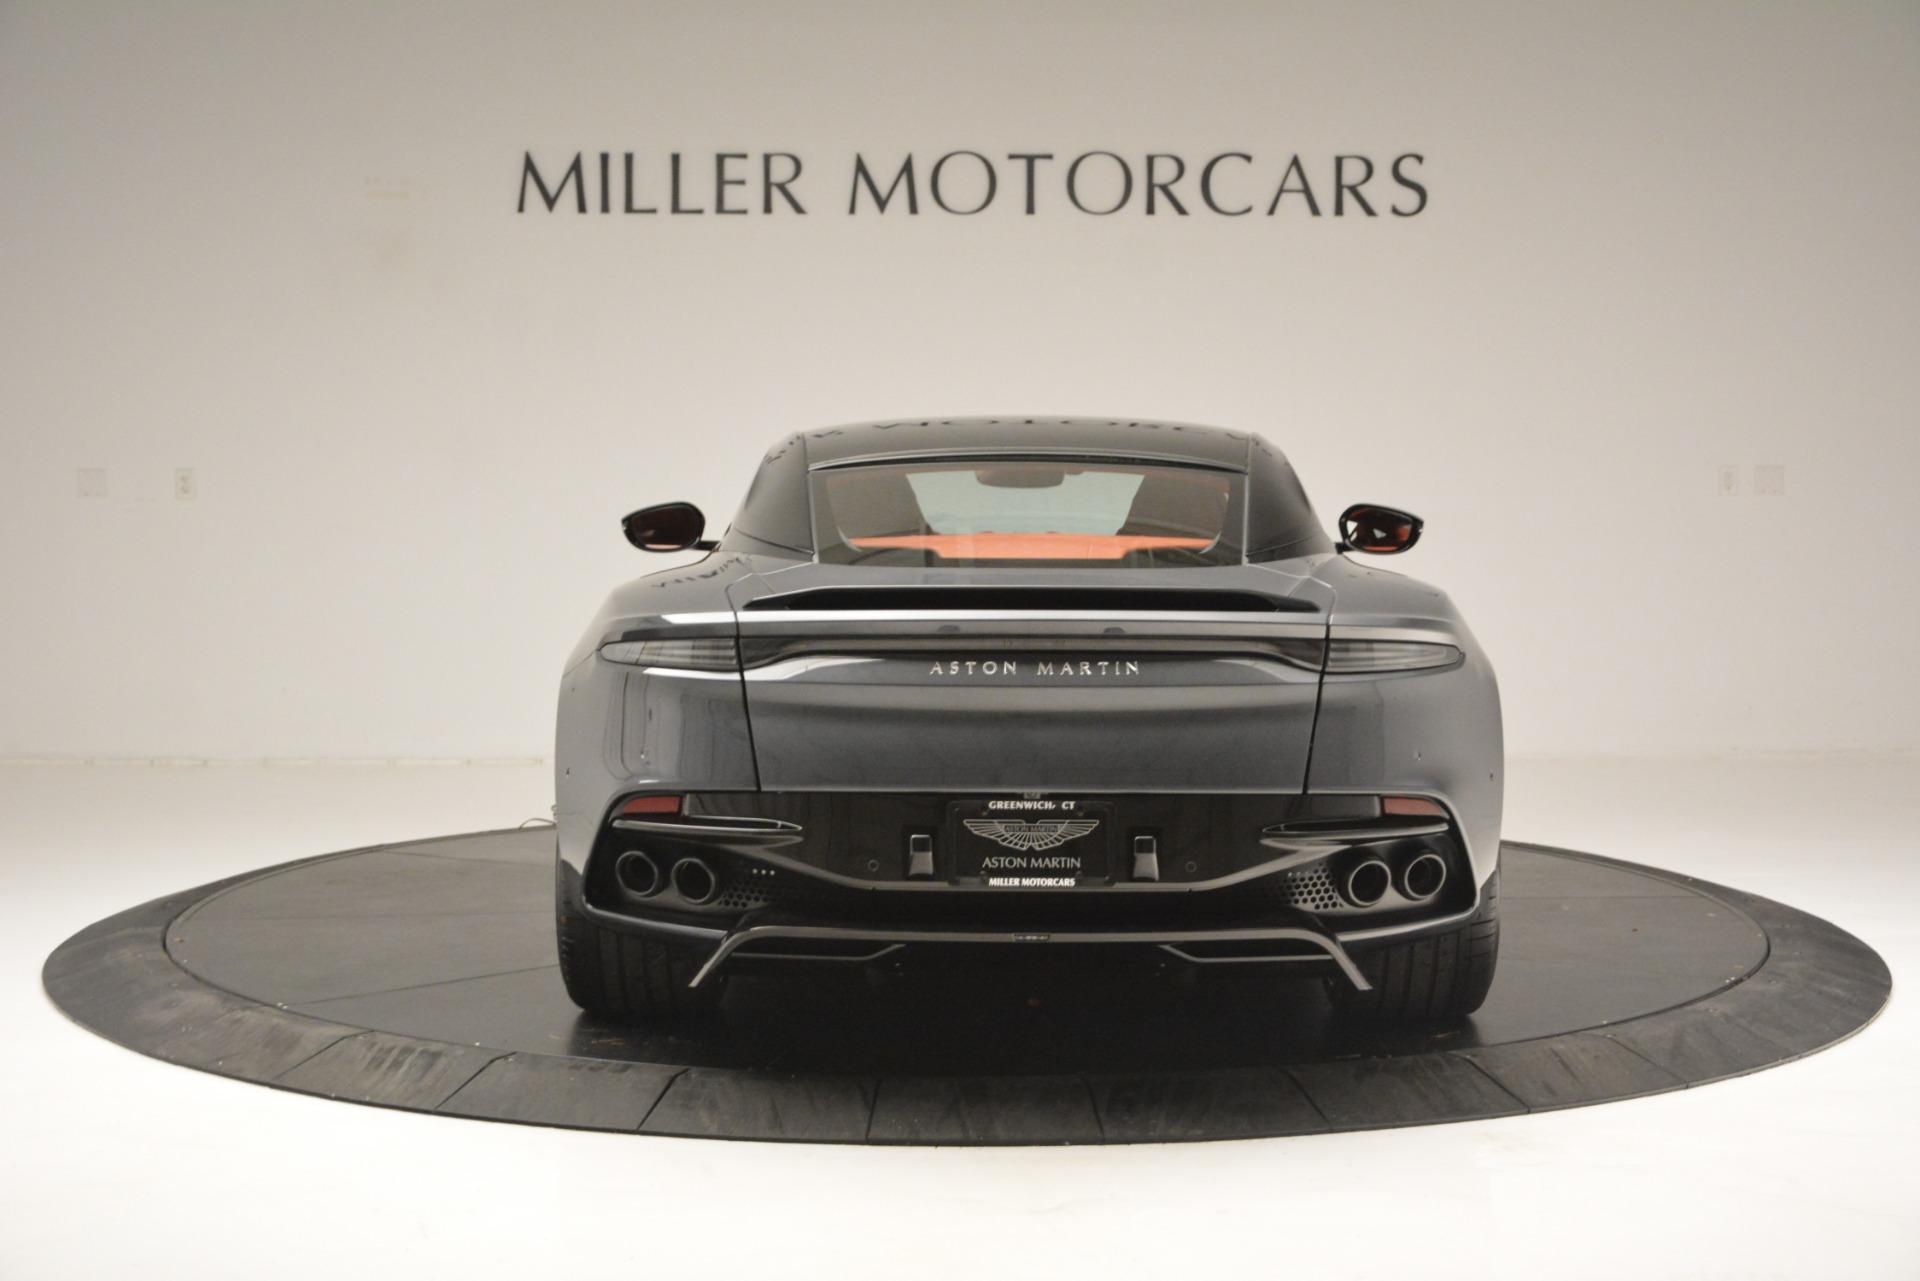 New 2019 Aston Martin DBS Superleggera For Sale In Greenwich, CT. Alfa Romeo of Greenwich, A1336 2827_p6